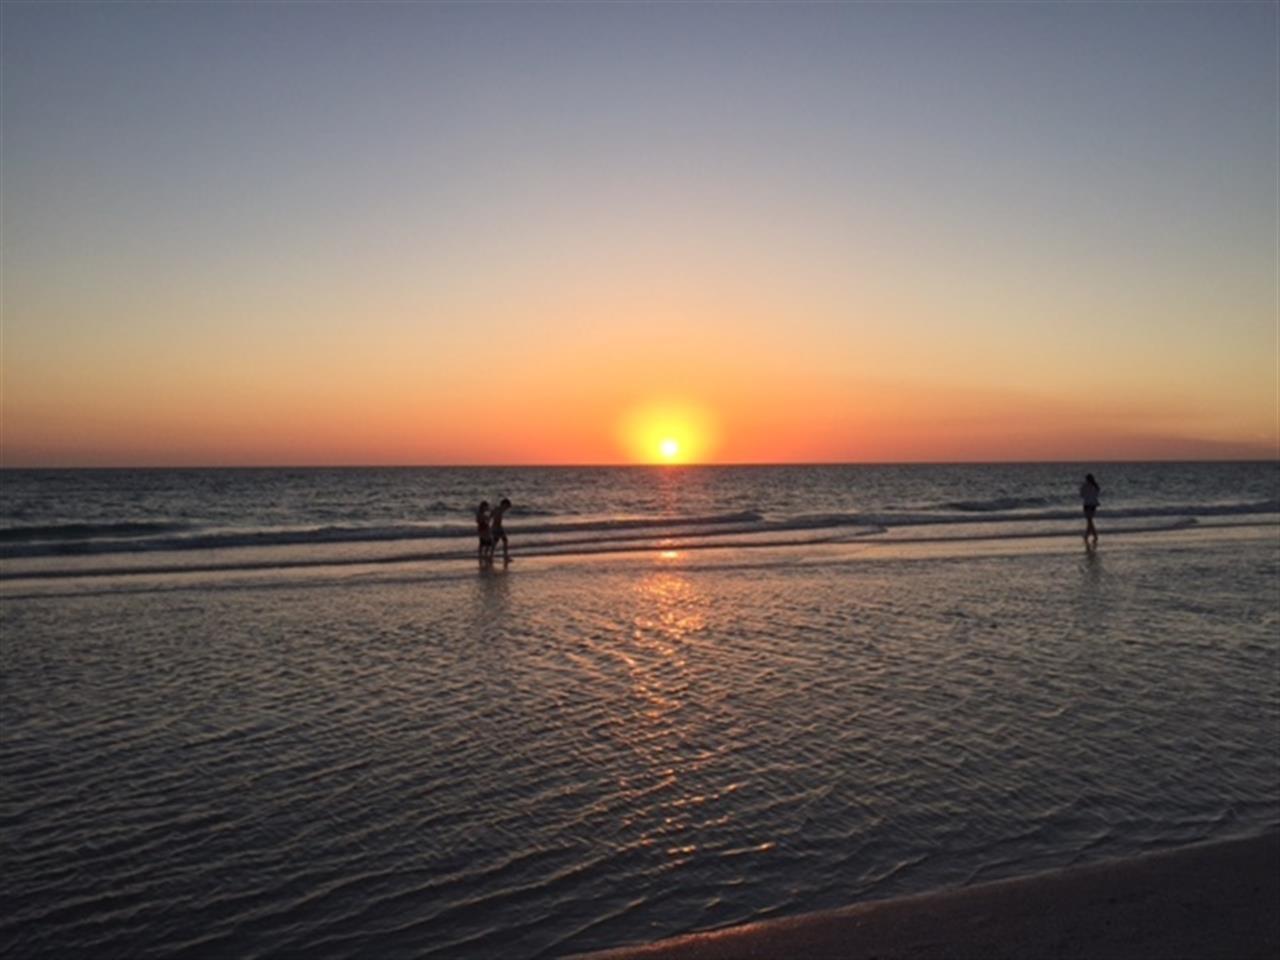 #LeadingRElocal #MarcoIsland #Florida #beach